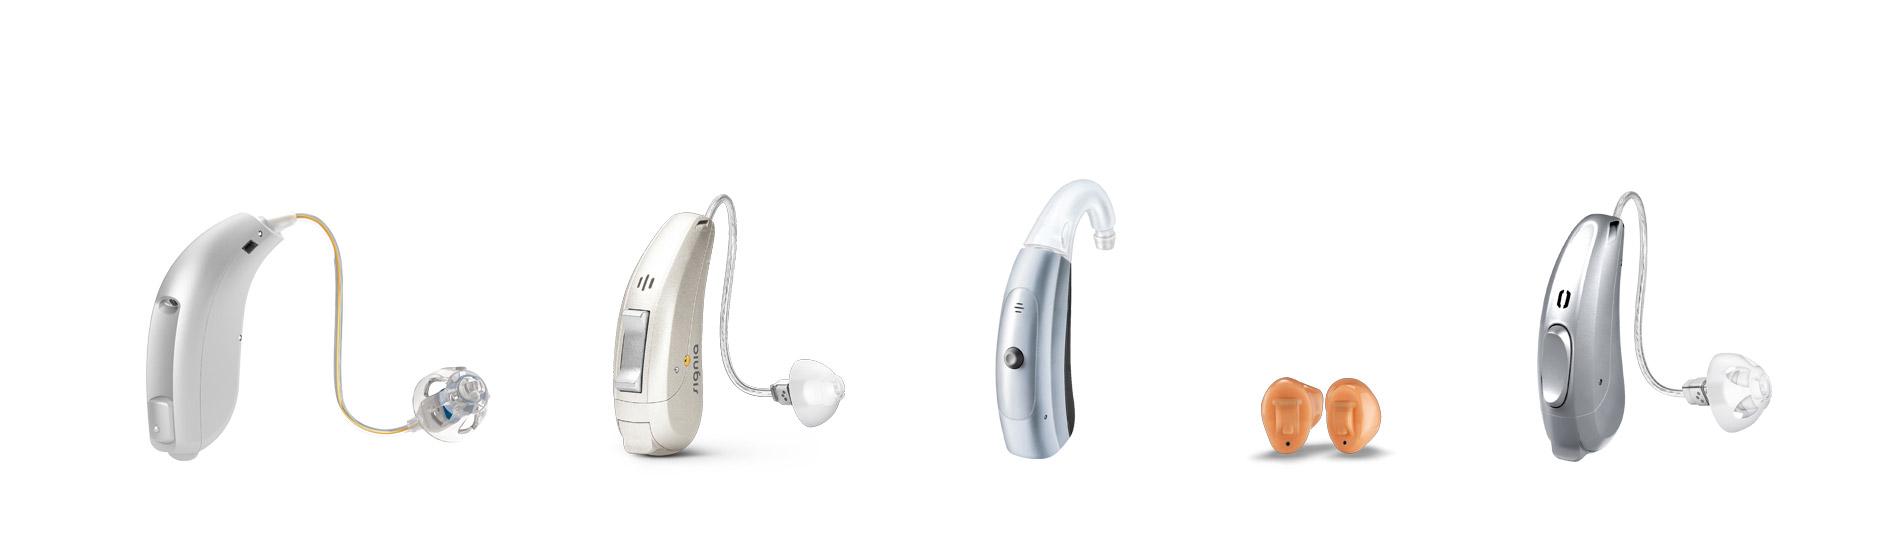 Nulltarif* Hörgeräte Slider 4 Hörgeräte